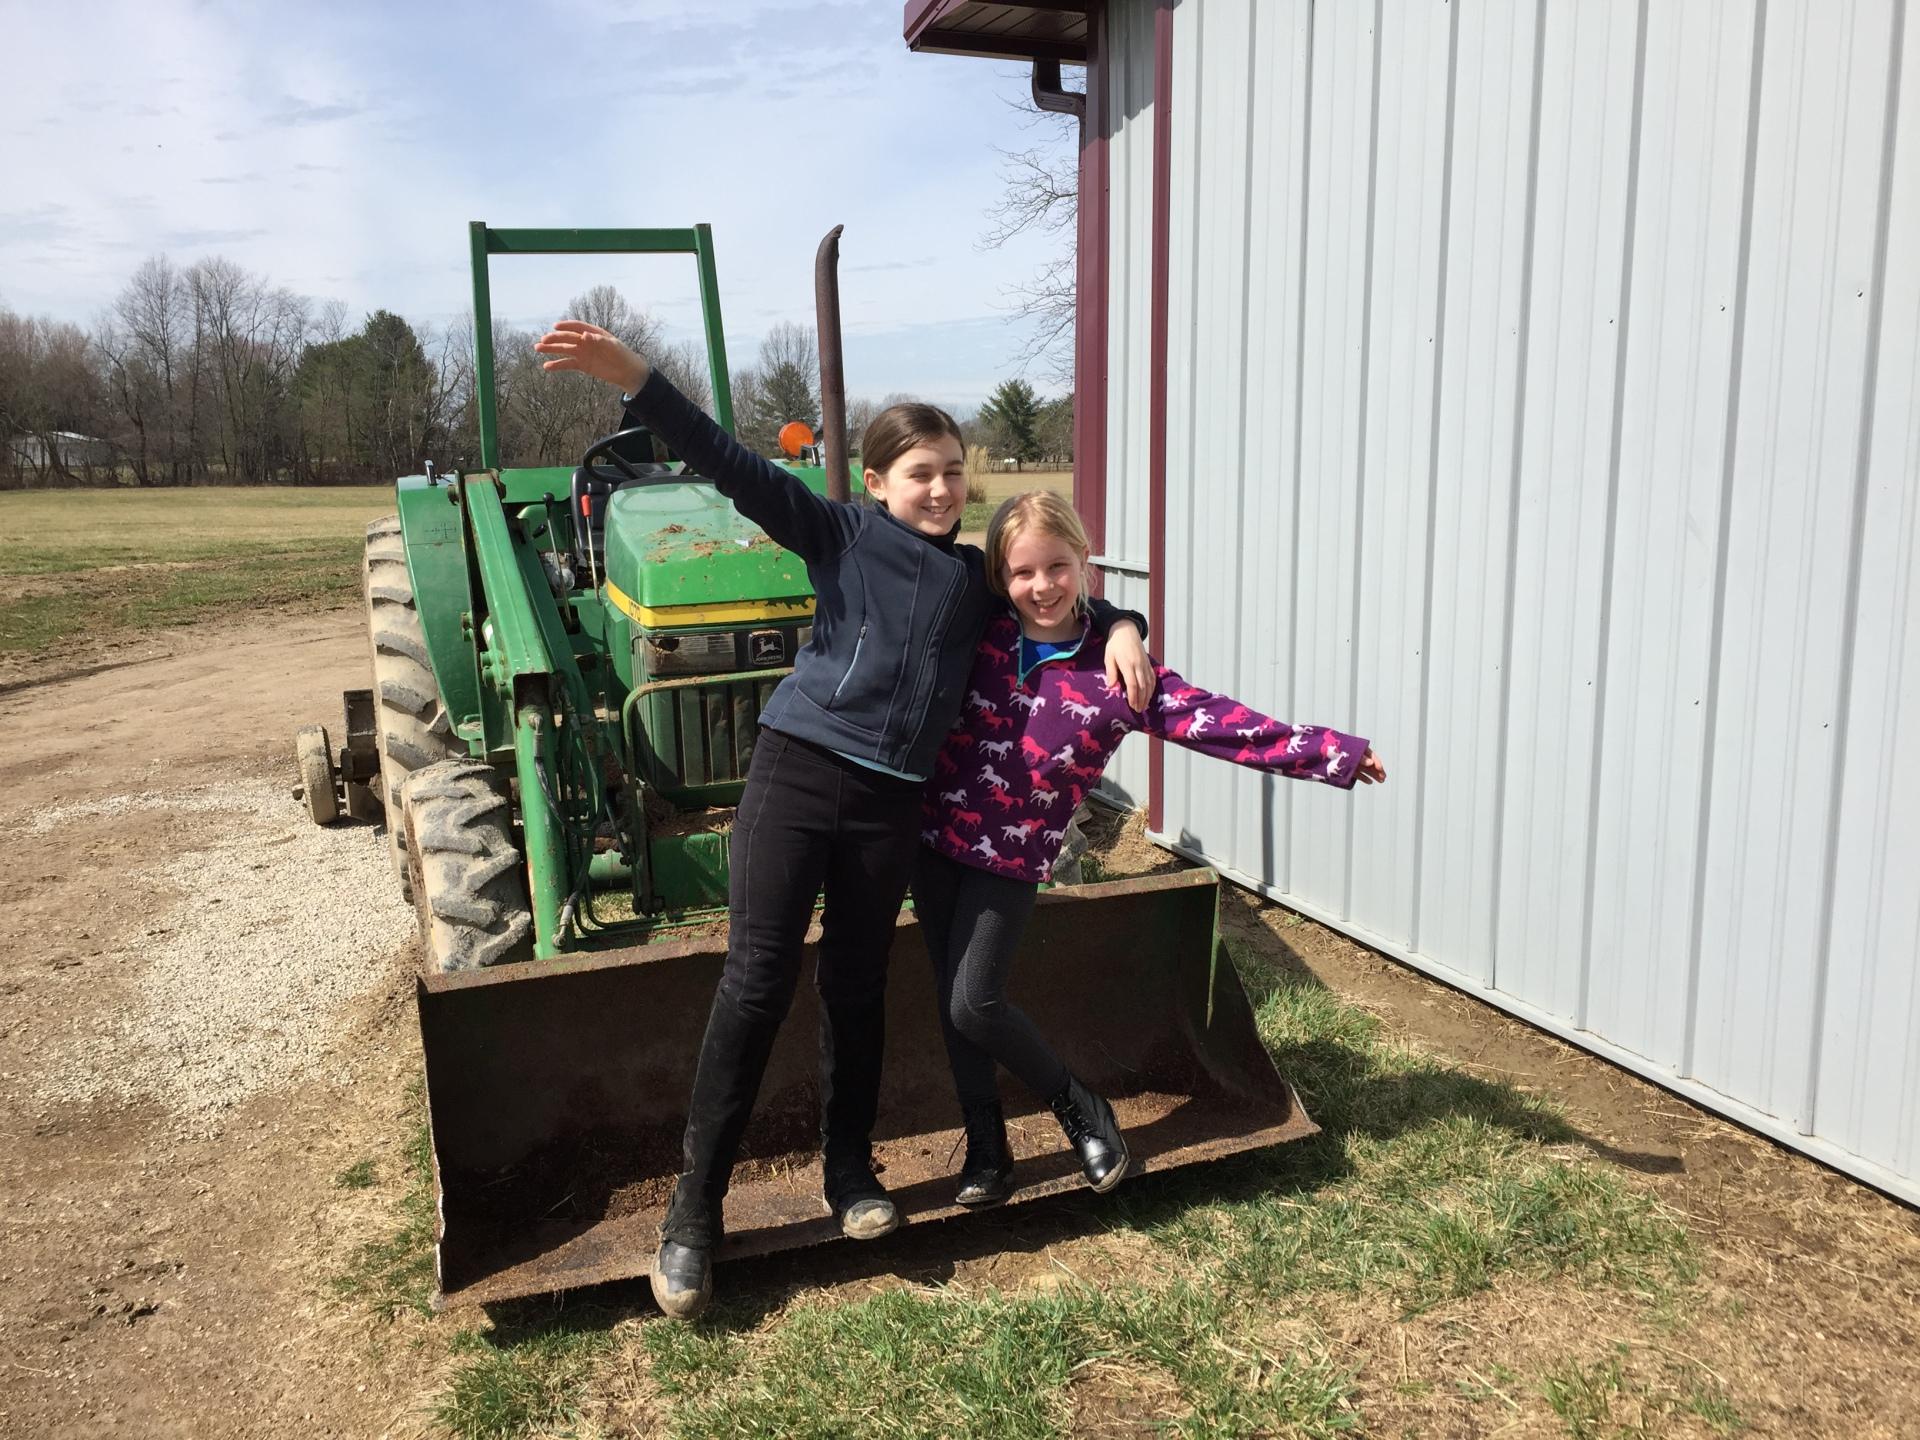 Stealaway Farm